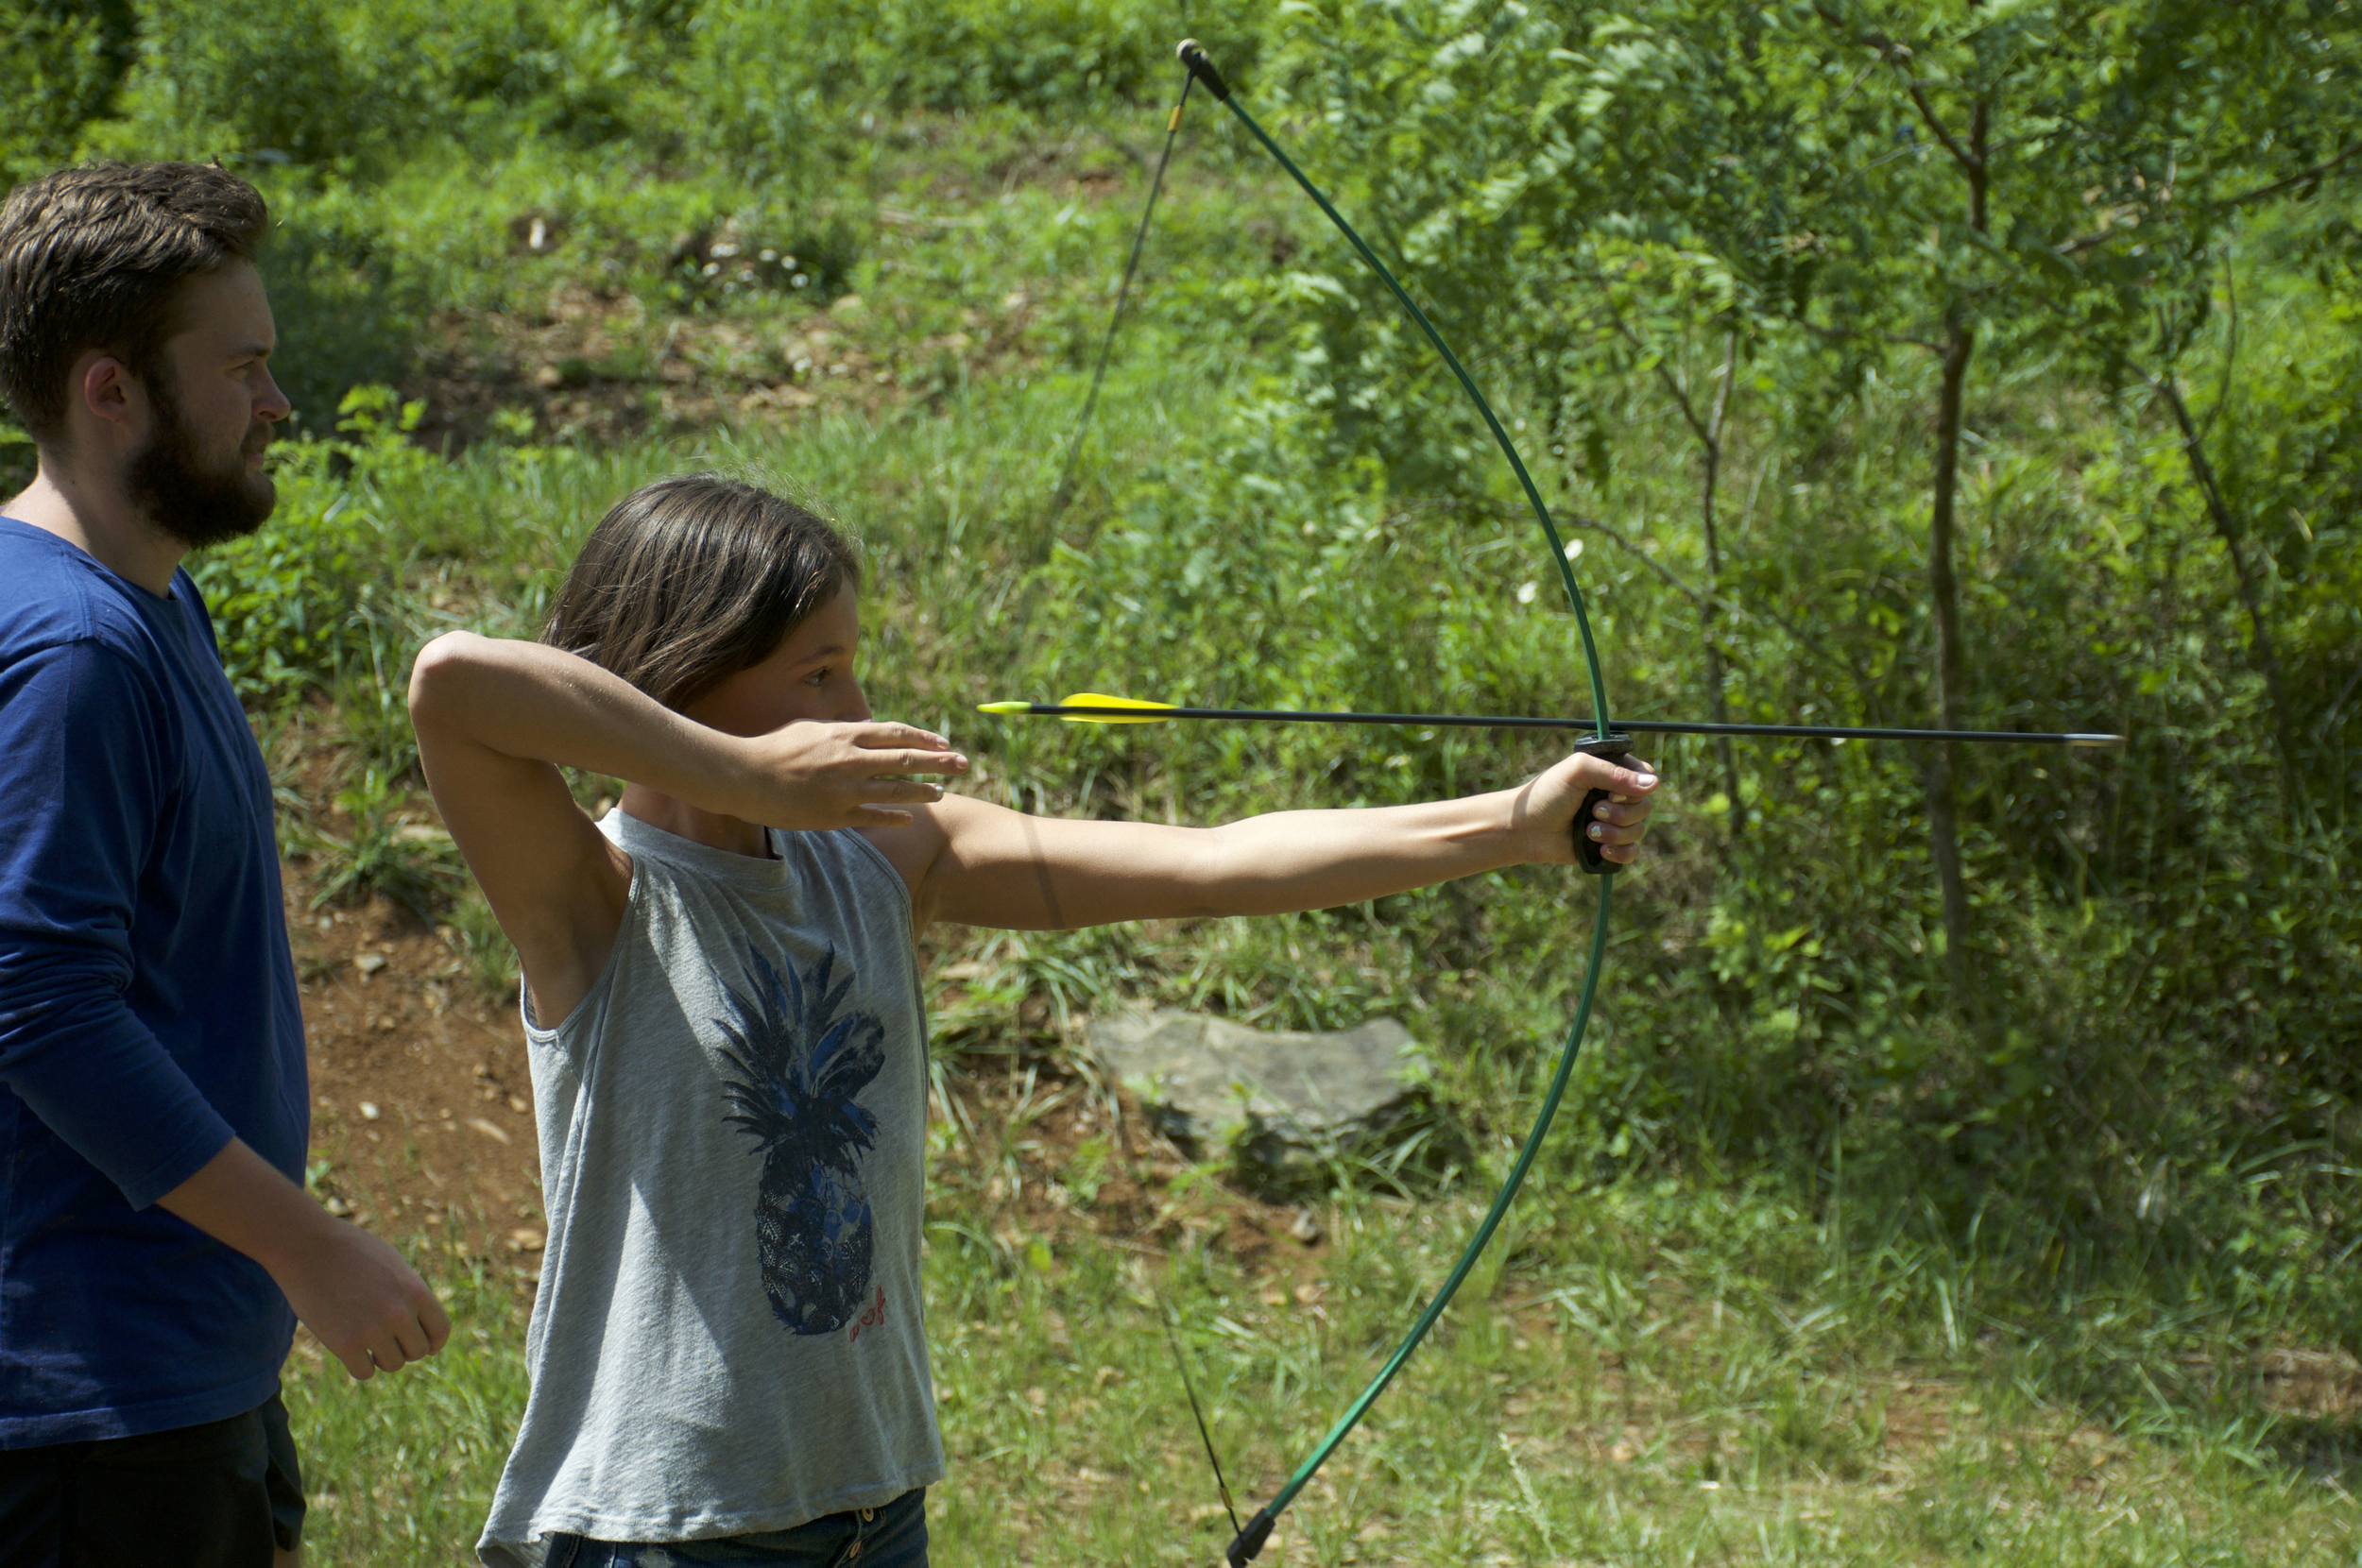 Taking aim in archery.